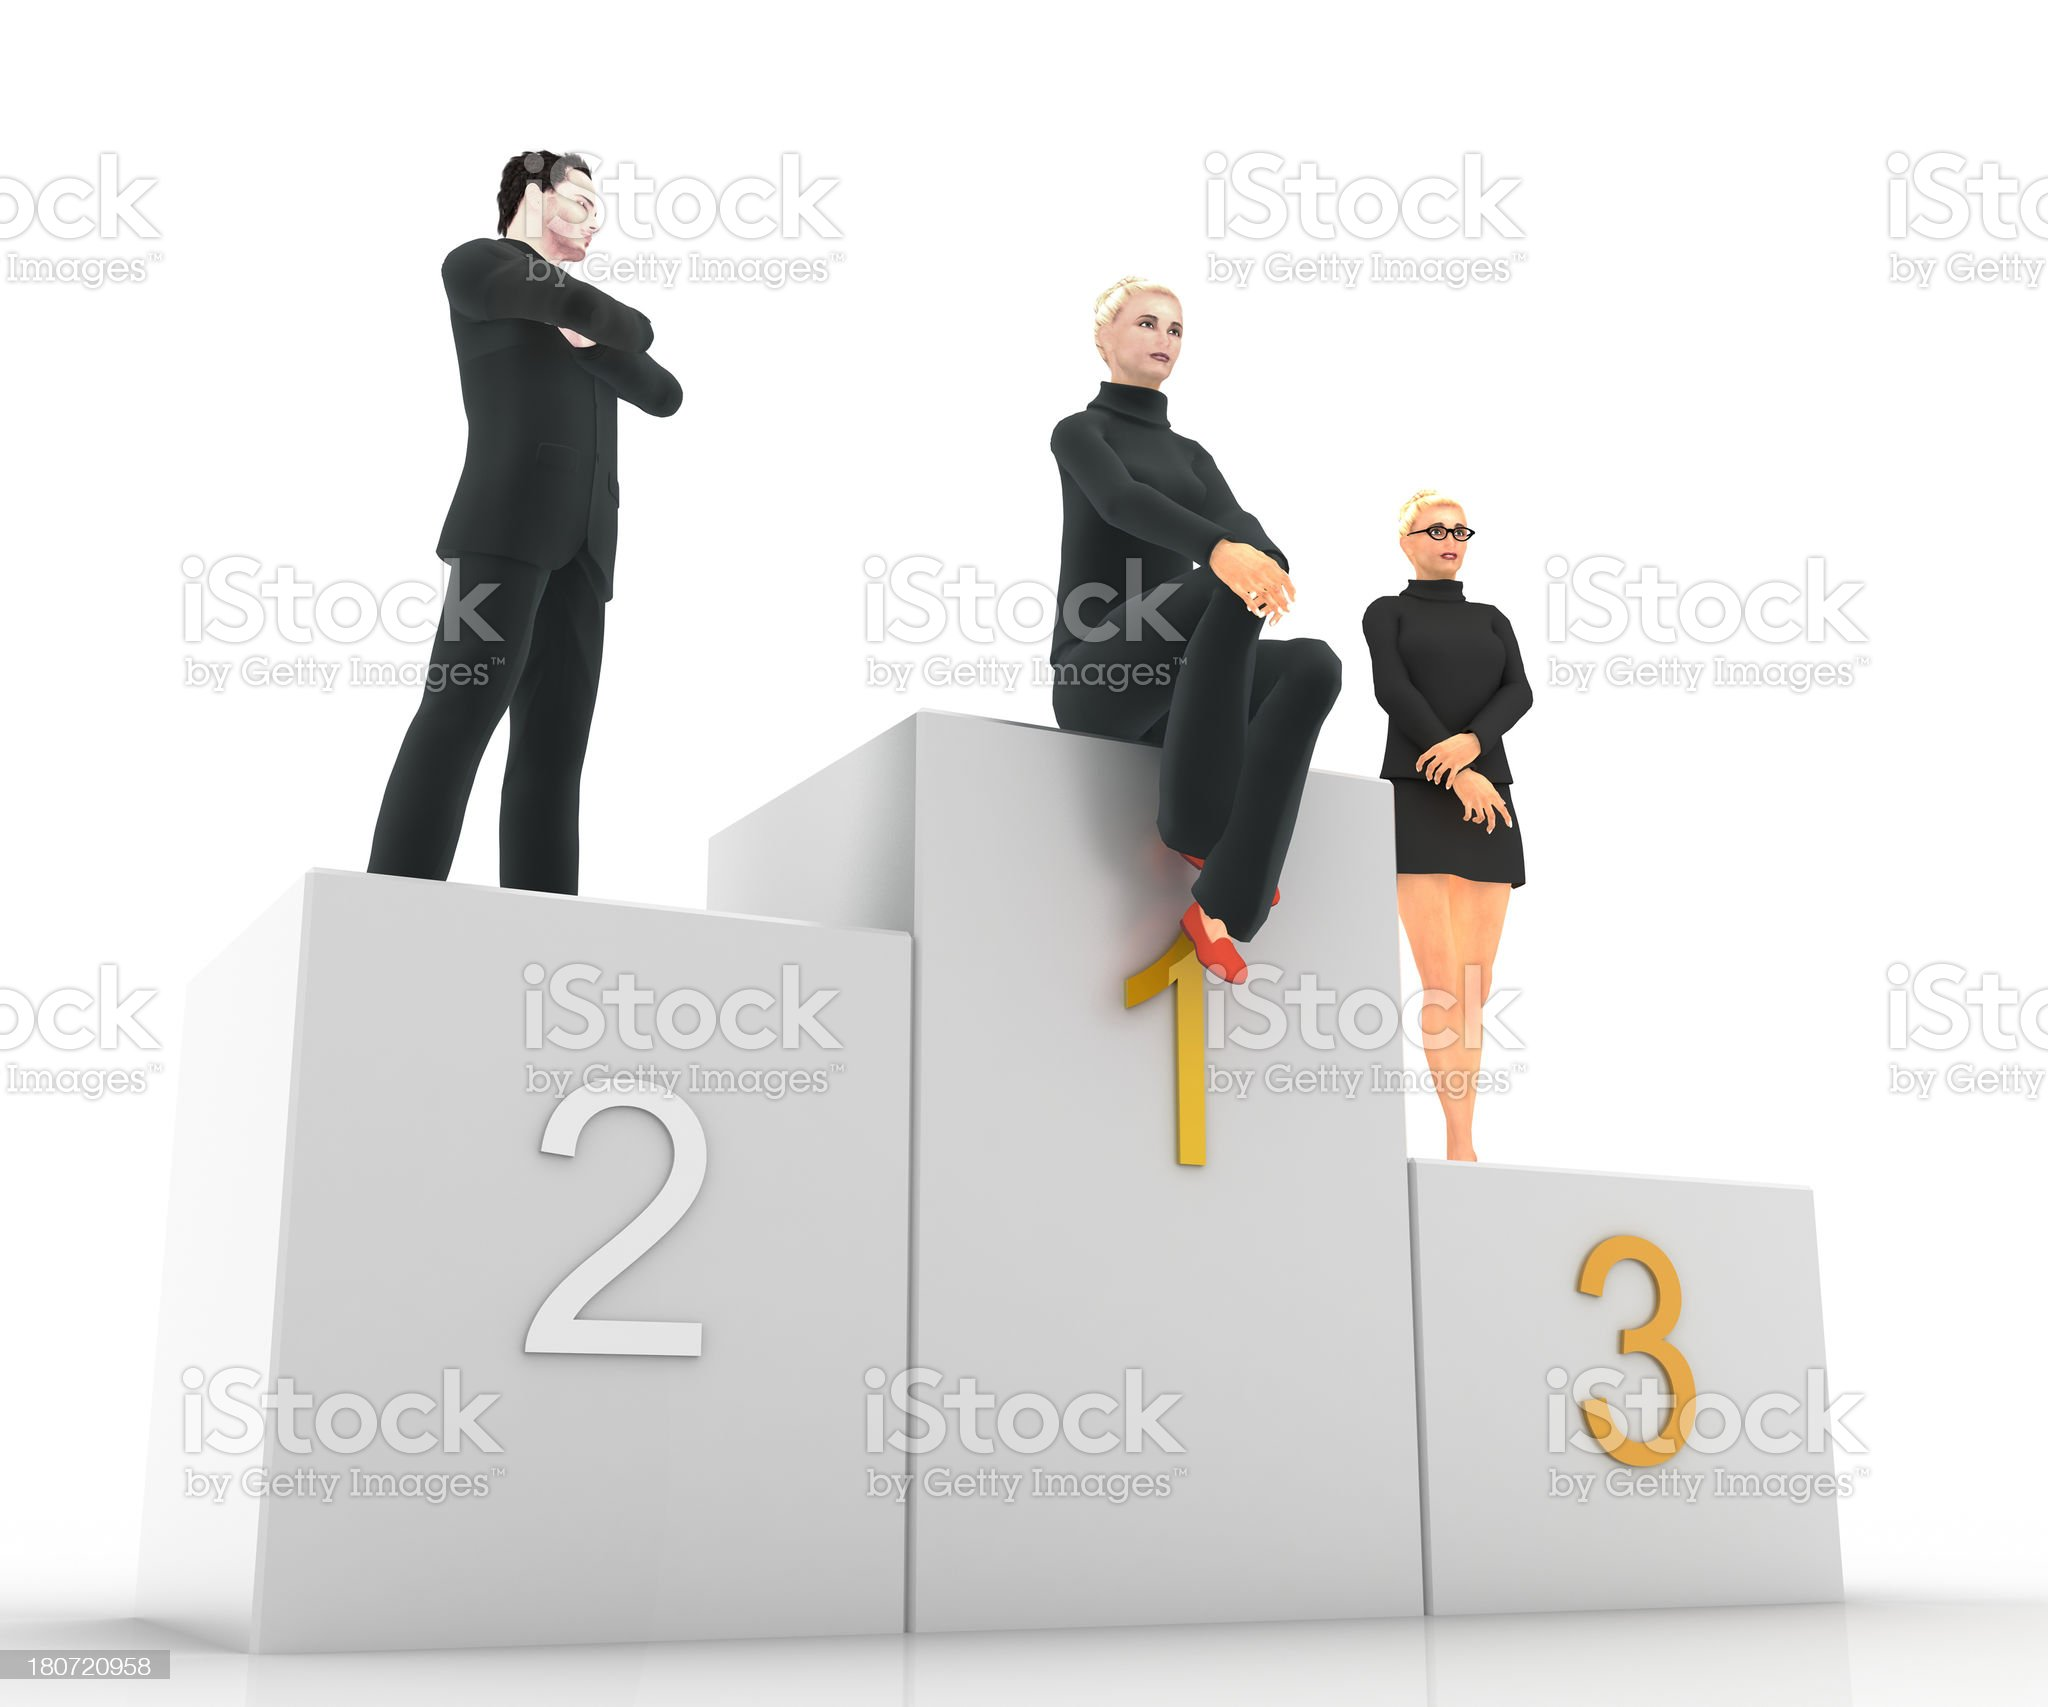 Corporate Podium royalty-free stock photo